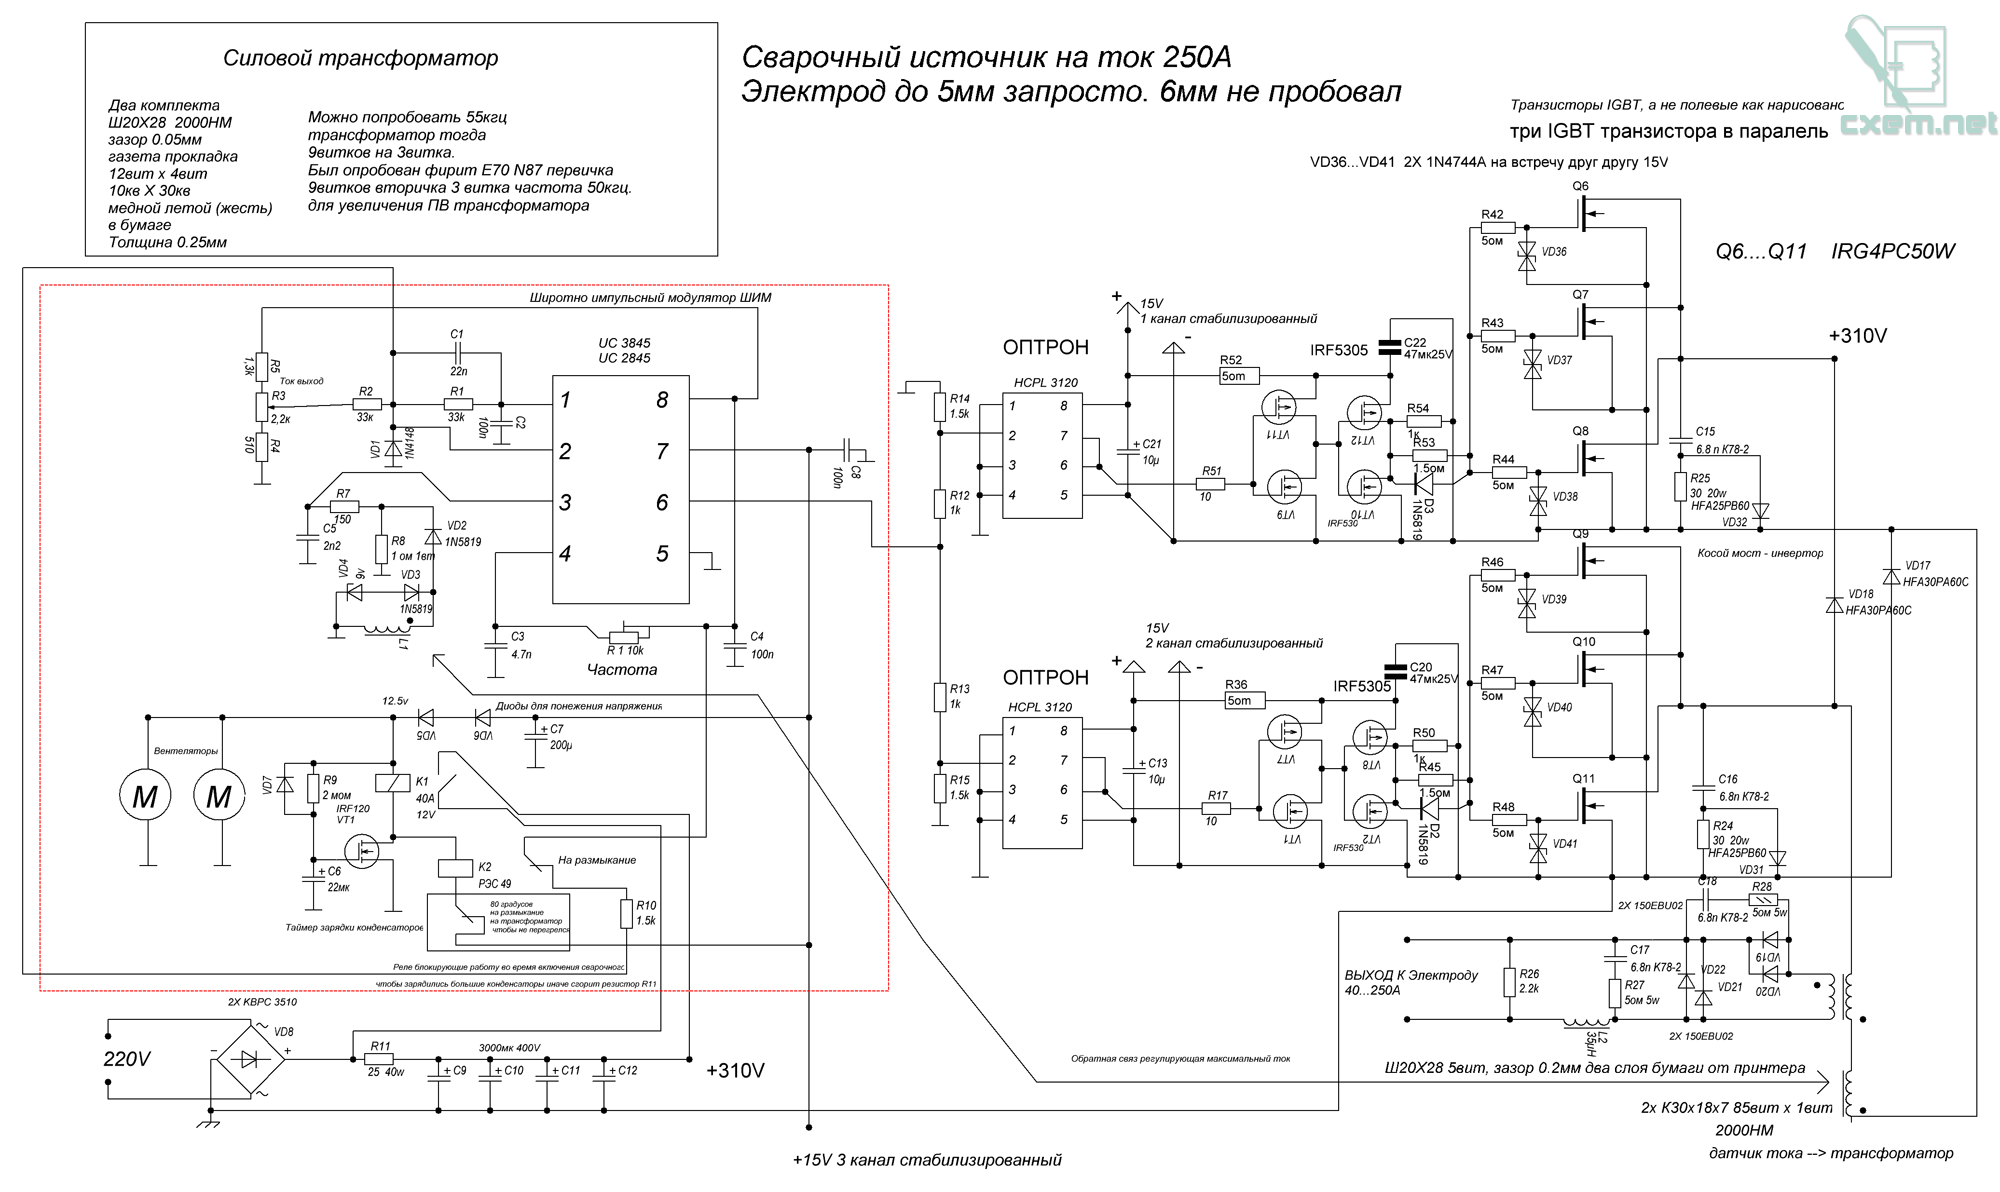 Схема сварочного инвертора ремонт руками фото 905